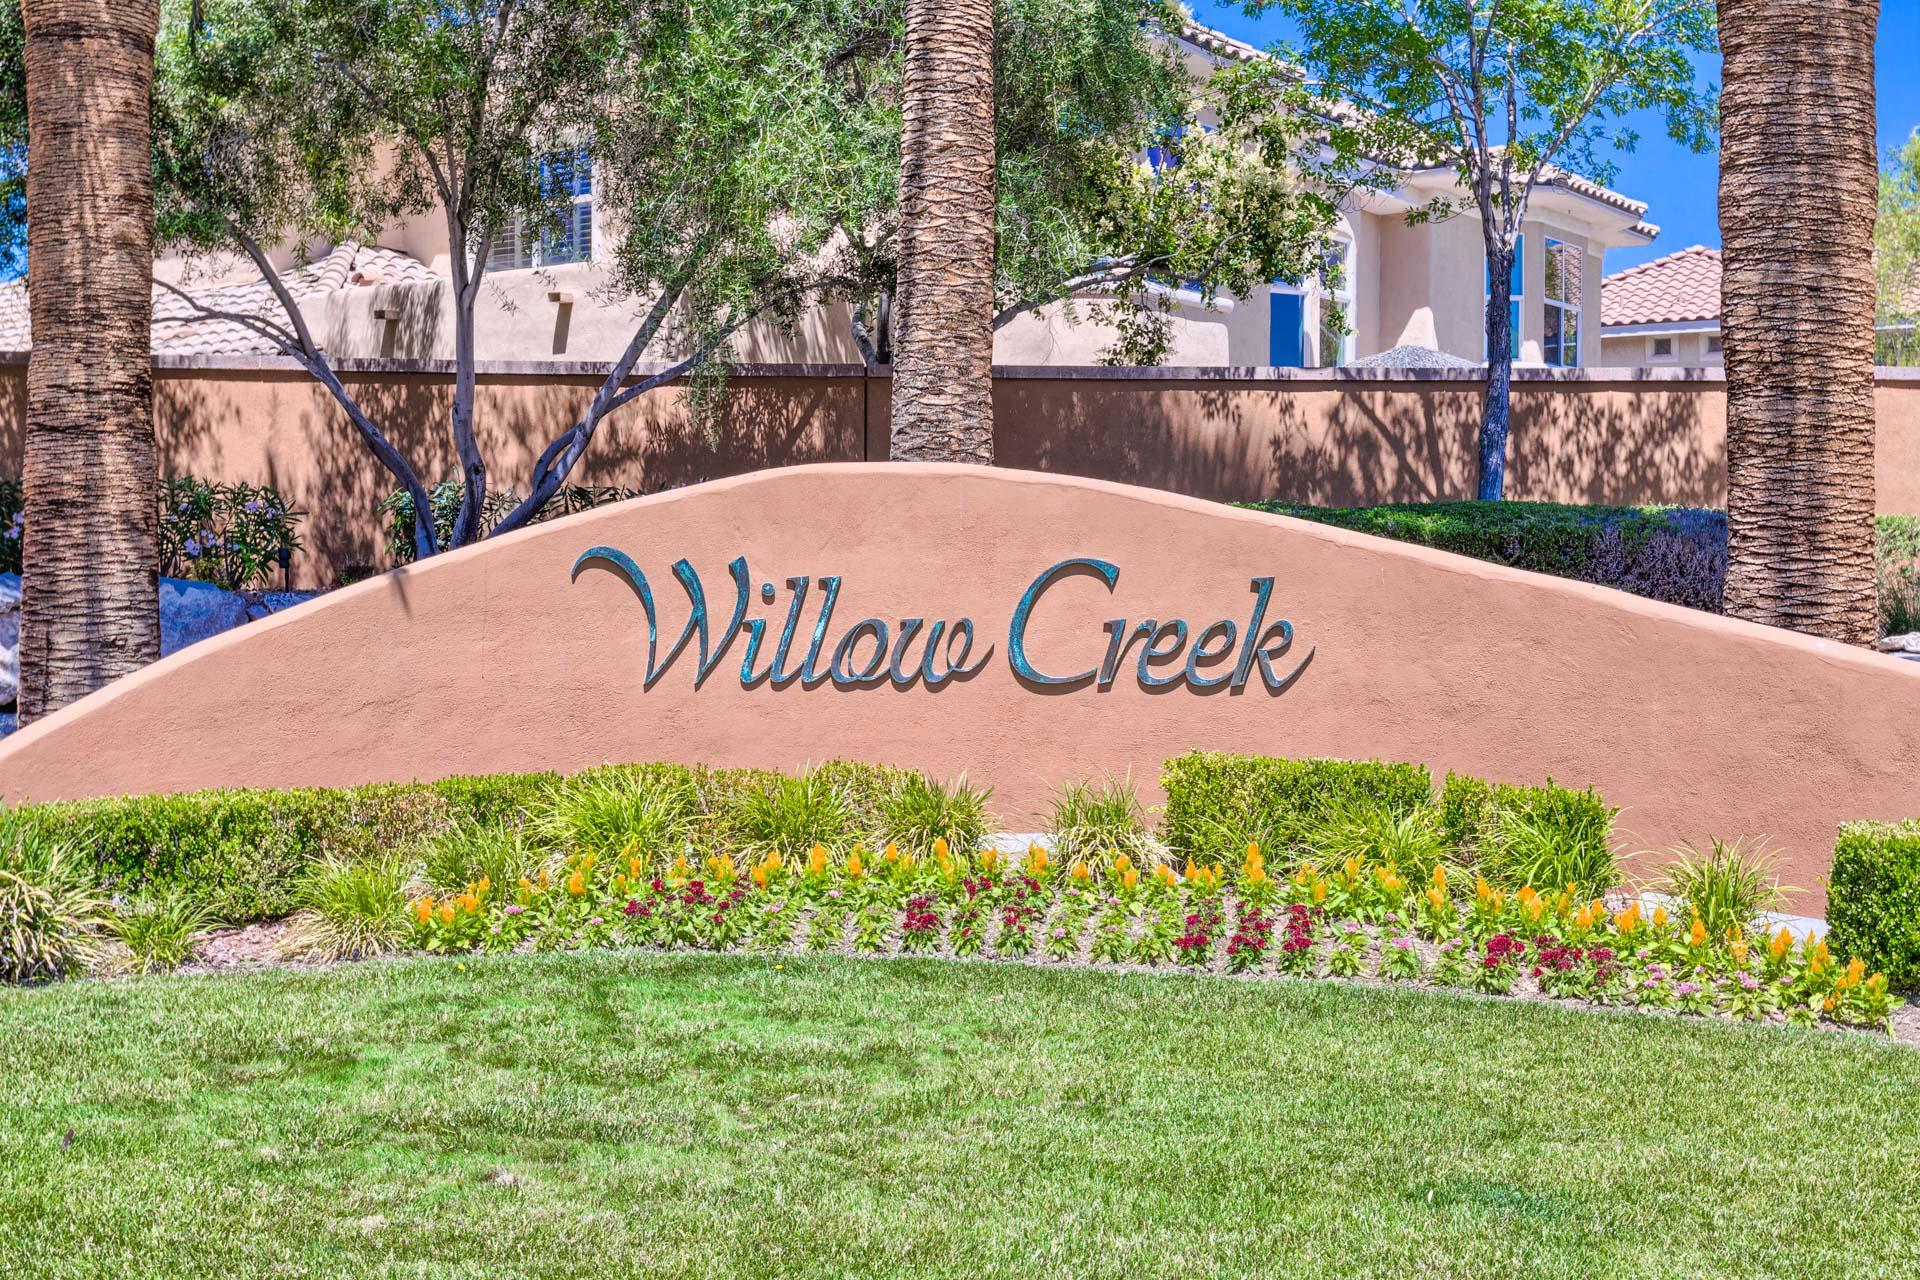 willow creek las vegas homes for sale